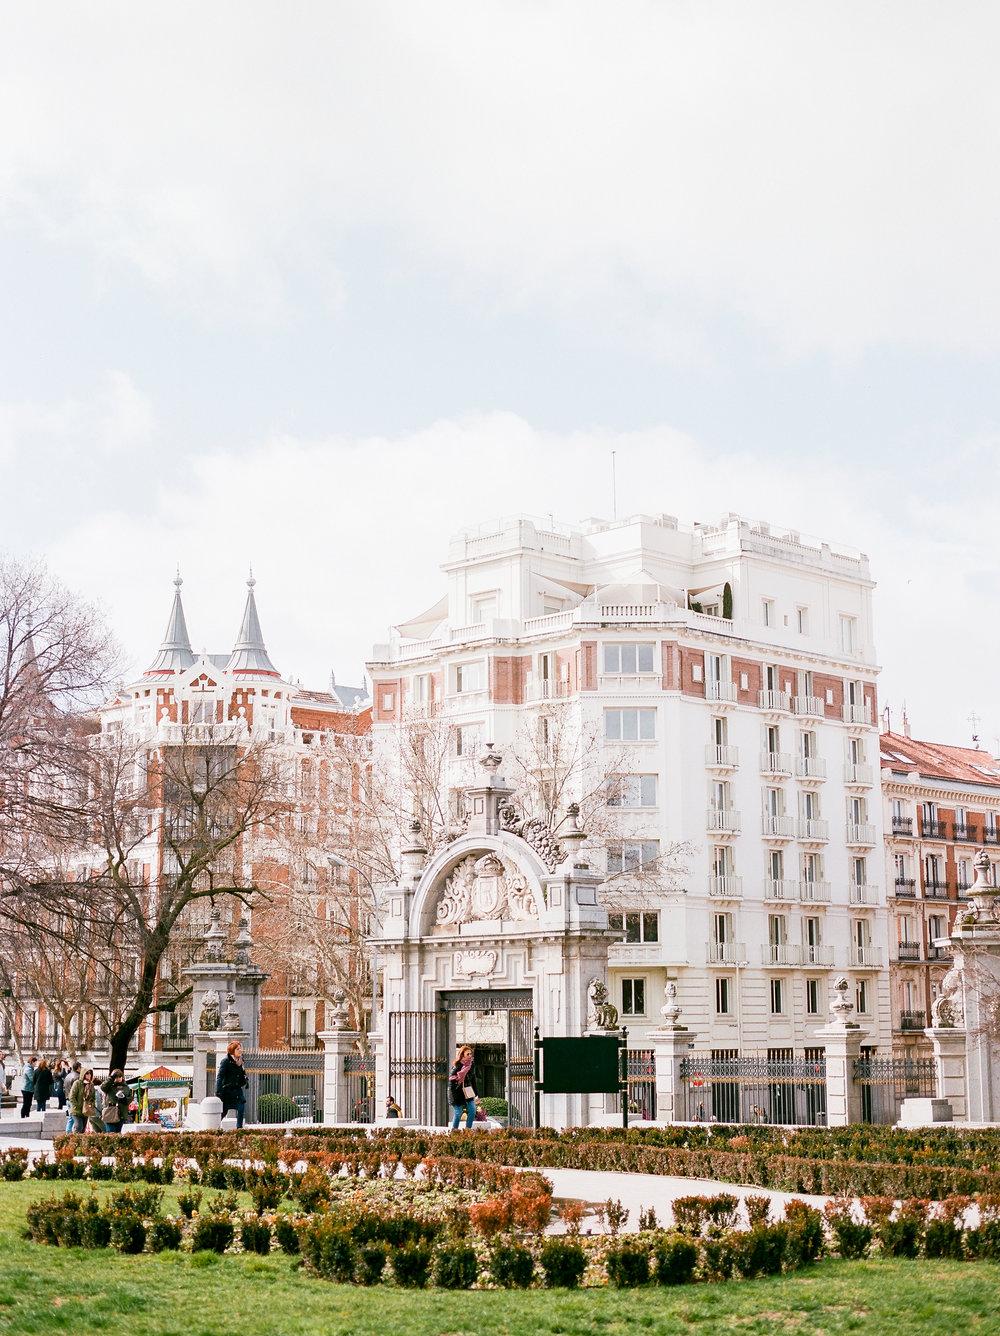 Destination-Spain-Travel-Film-Photographer-1.jpg